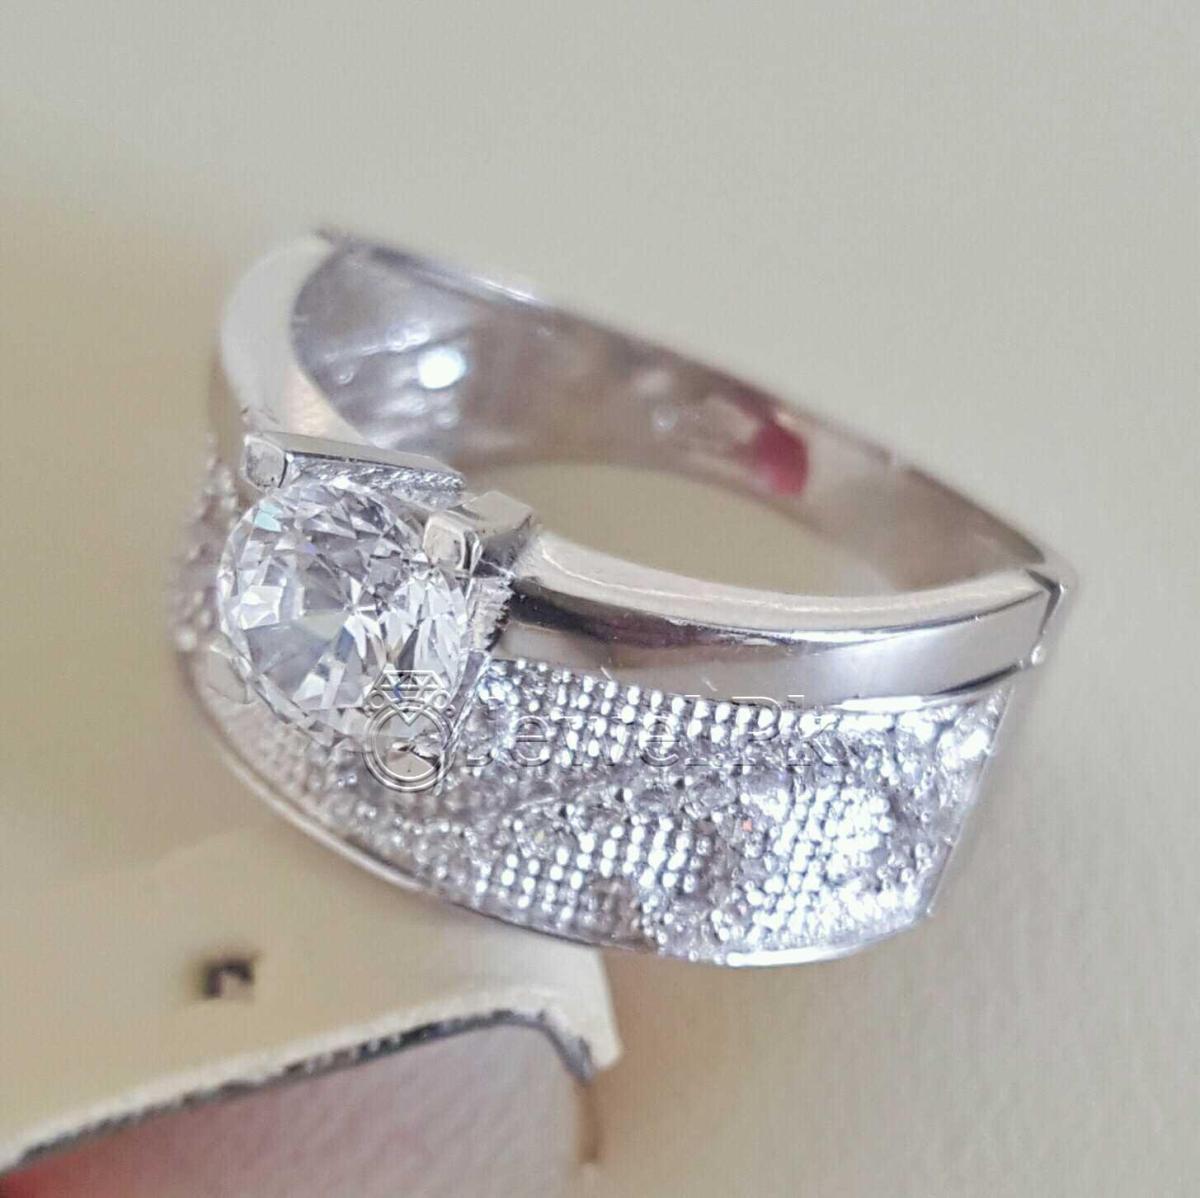 925 Silver Luxury Rings for Ladies Women Silver Rings Woman Handmade Rings 36 natural gemstones pakistan + 925 silver jewelry online